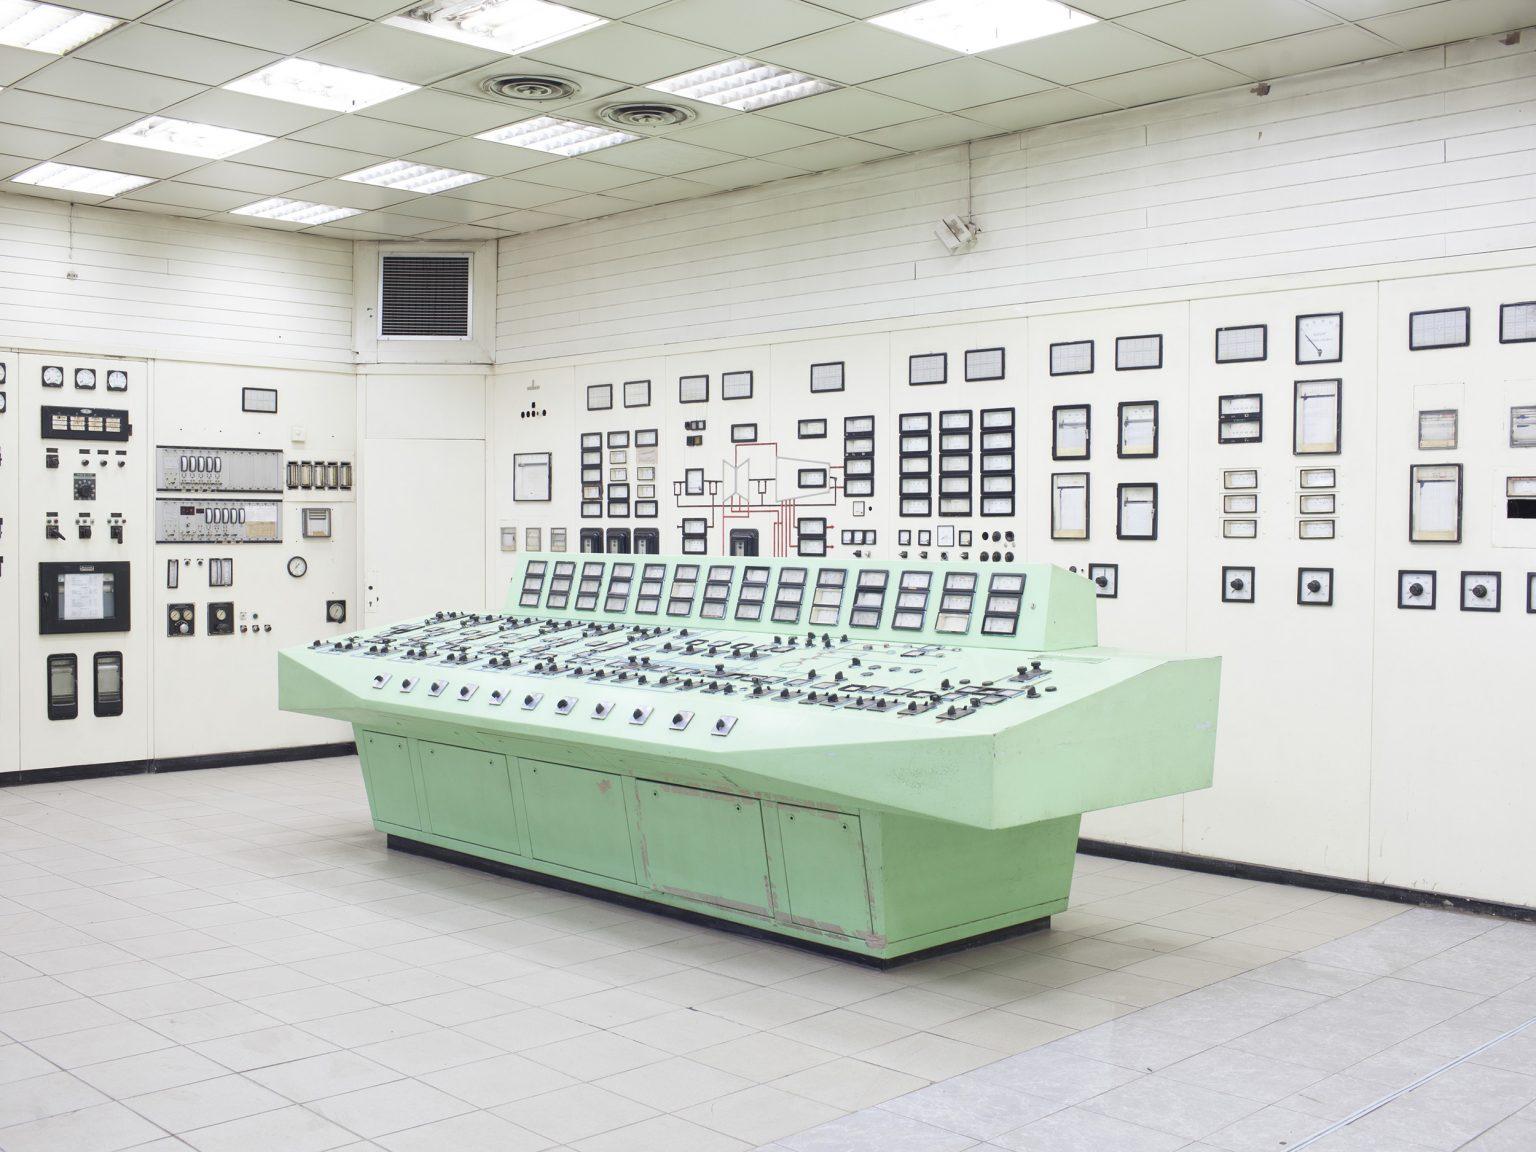 View of the elettric network command room in the Kosovo Energy Corporation (KEK) coal plant of Obiliq / Obilić.